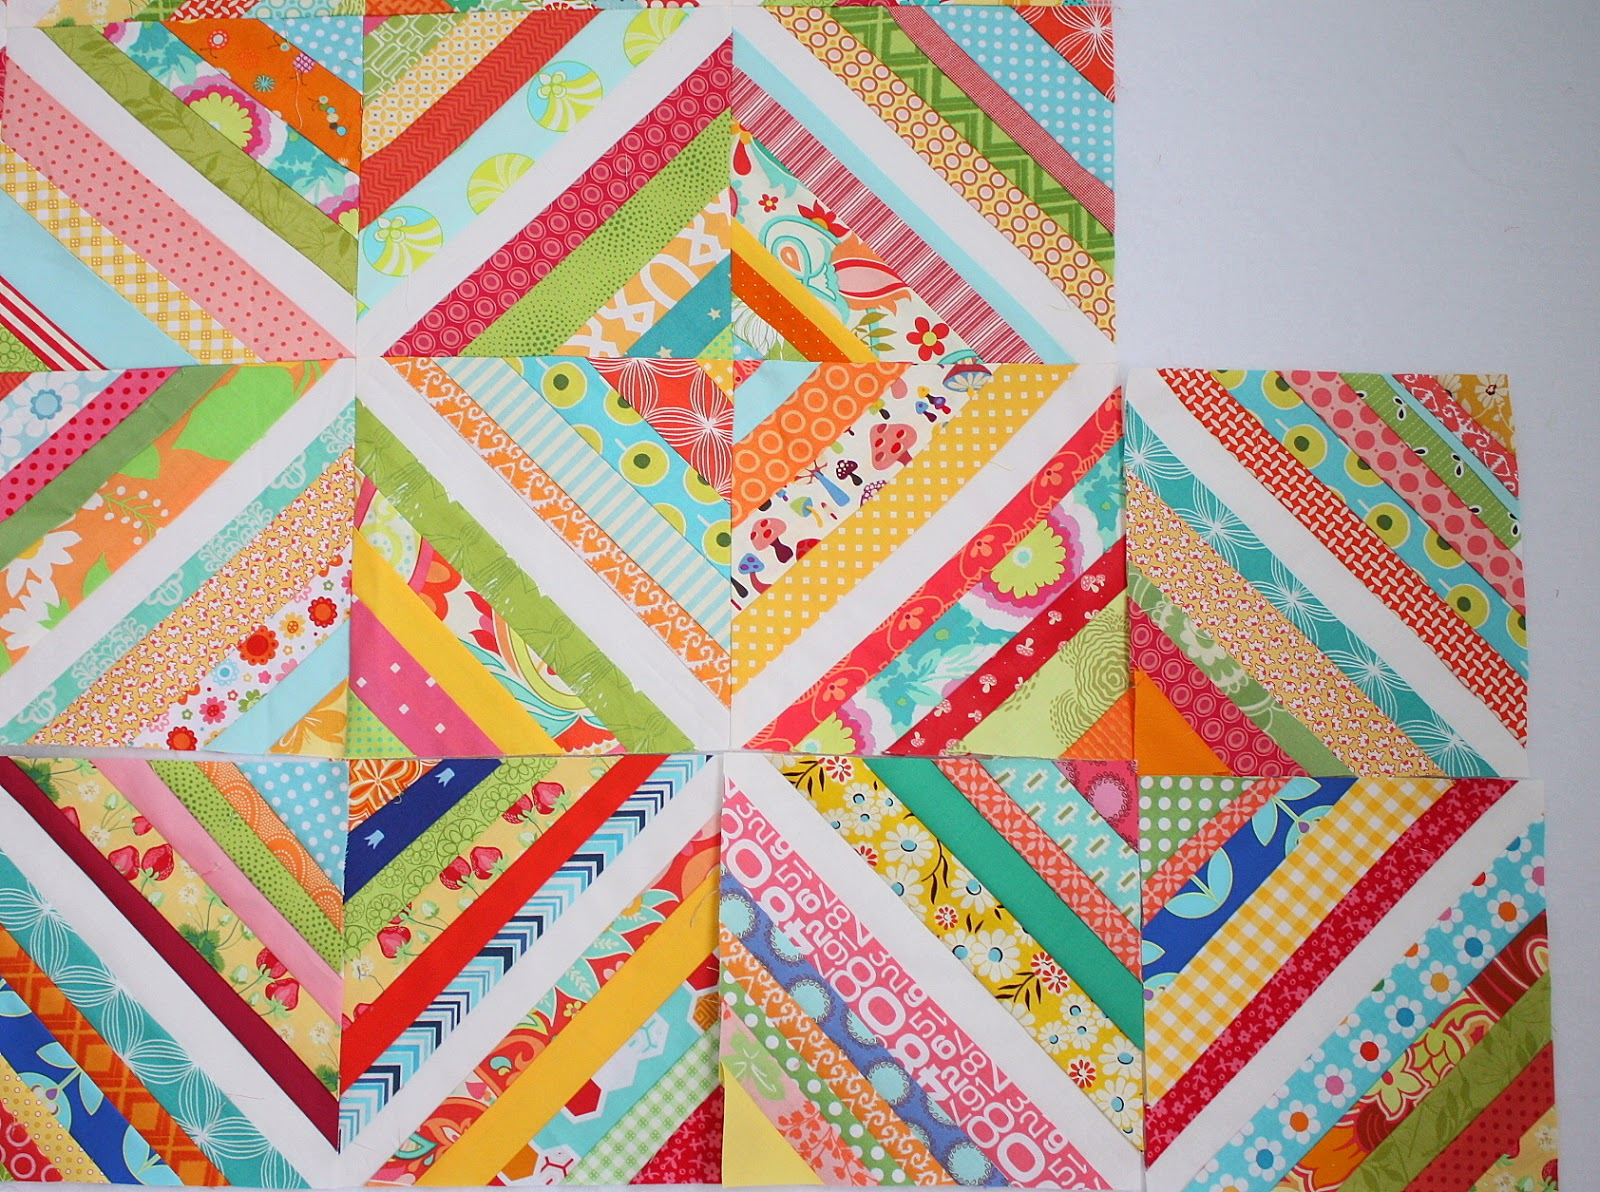 Scrap Quilt Block Patterns - Patterns Kid